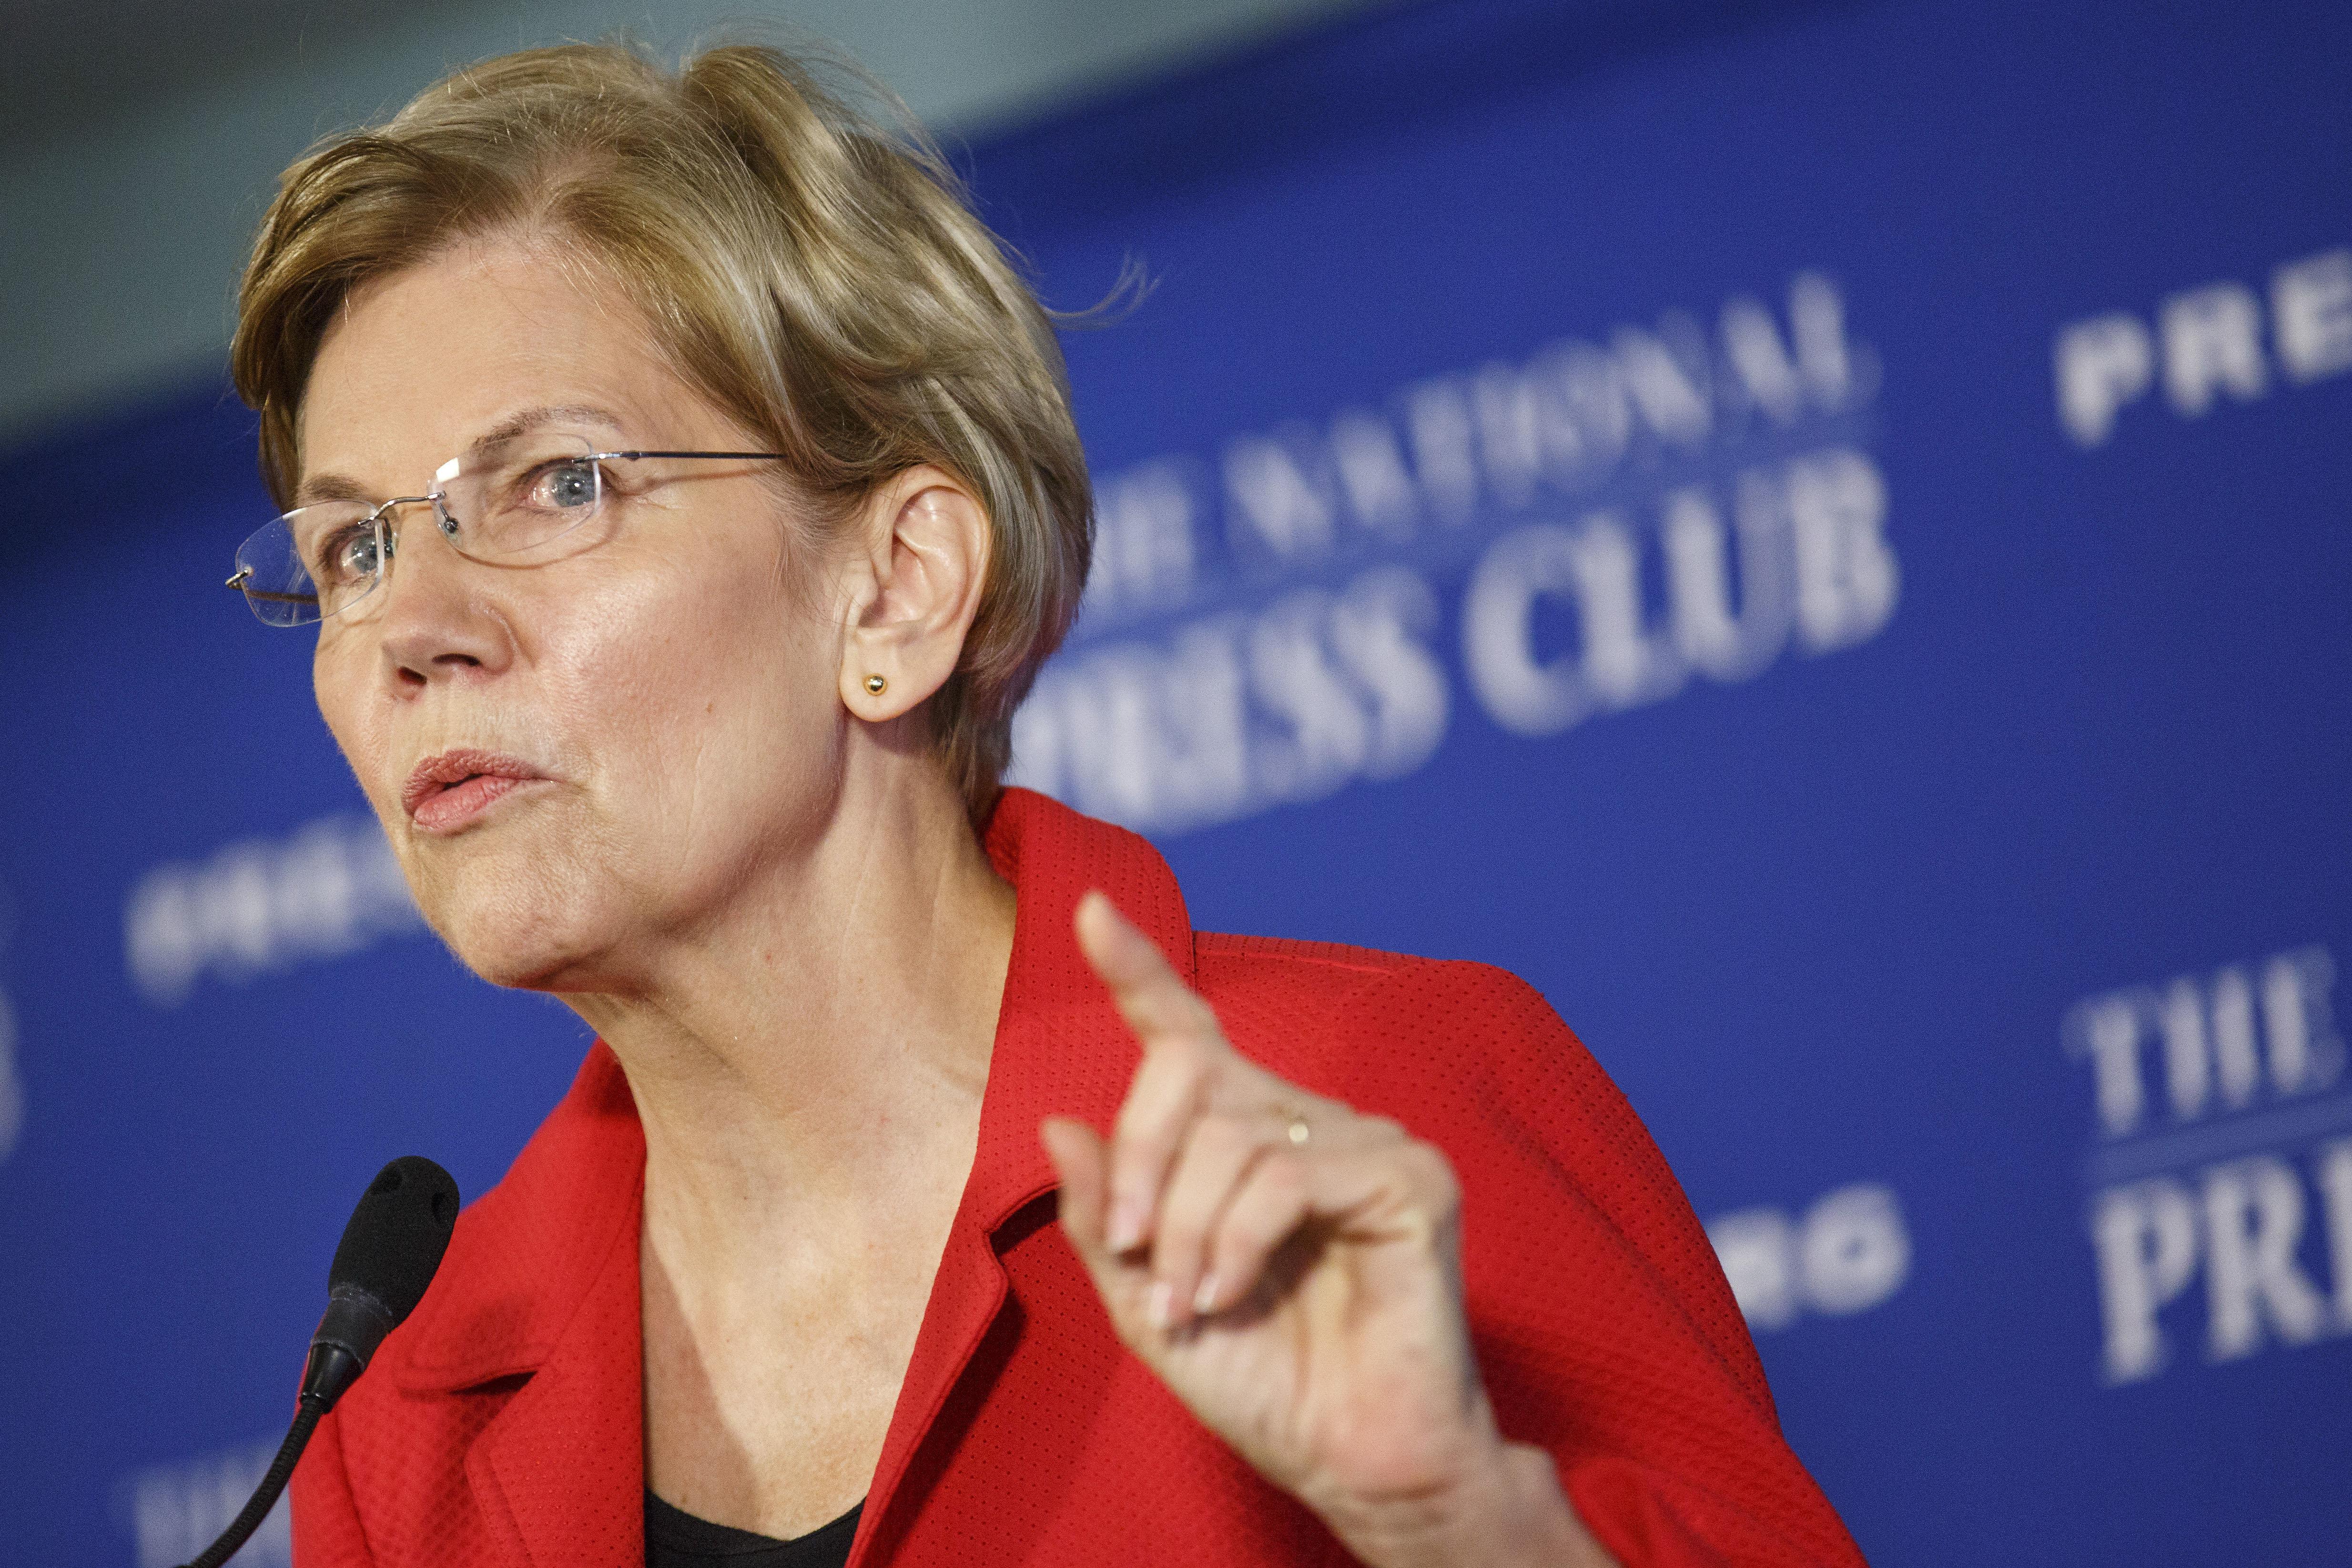 Sen. Elizabeth Warren speaks at the National Press Club inWashington, D.C., on Tuesday, Aug. 21, 2018.